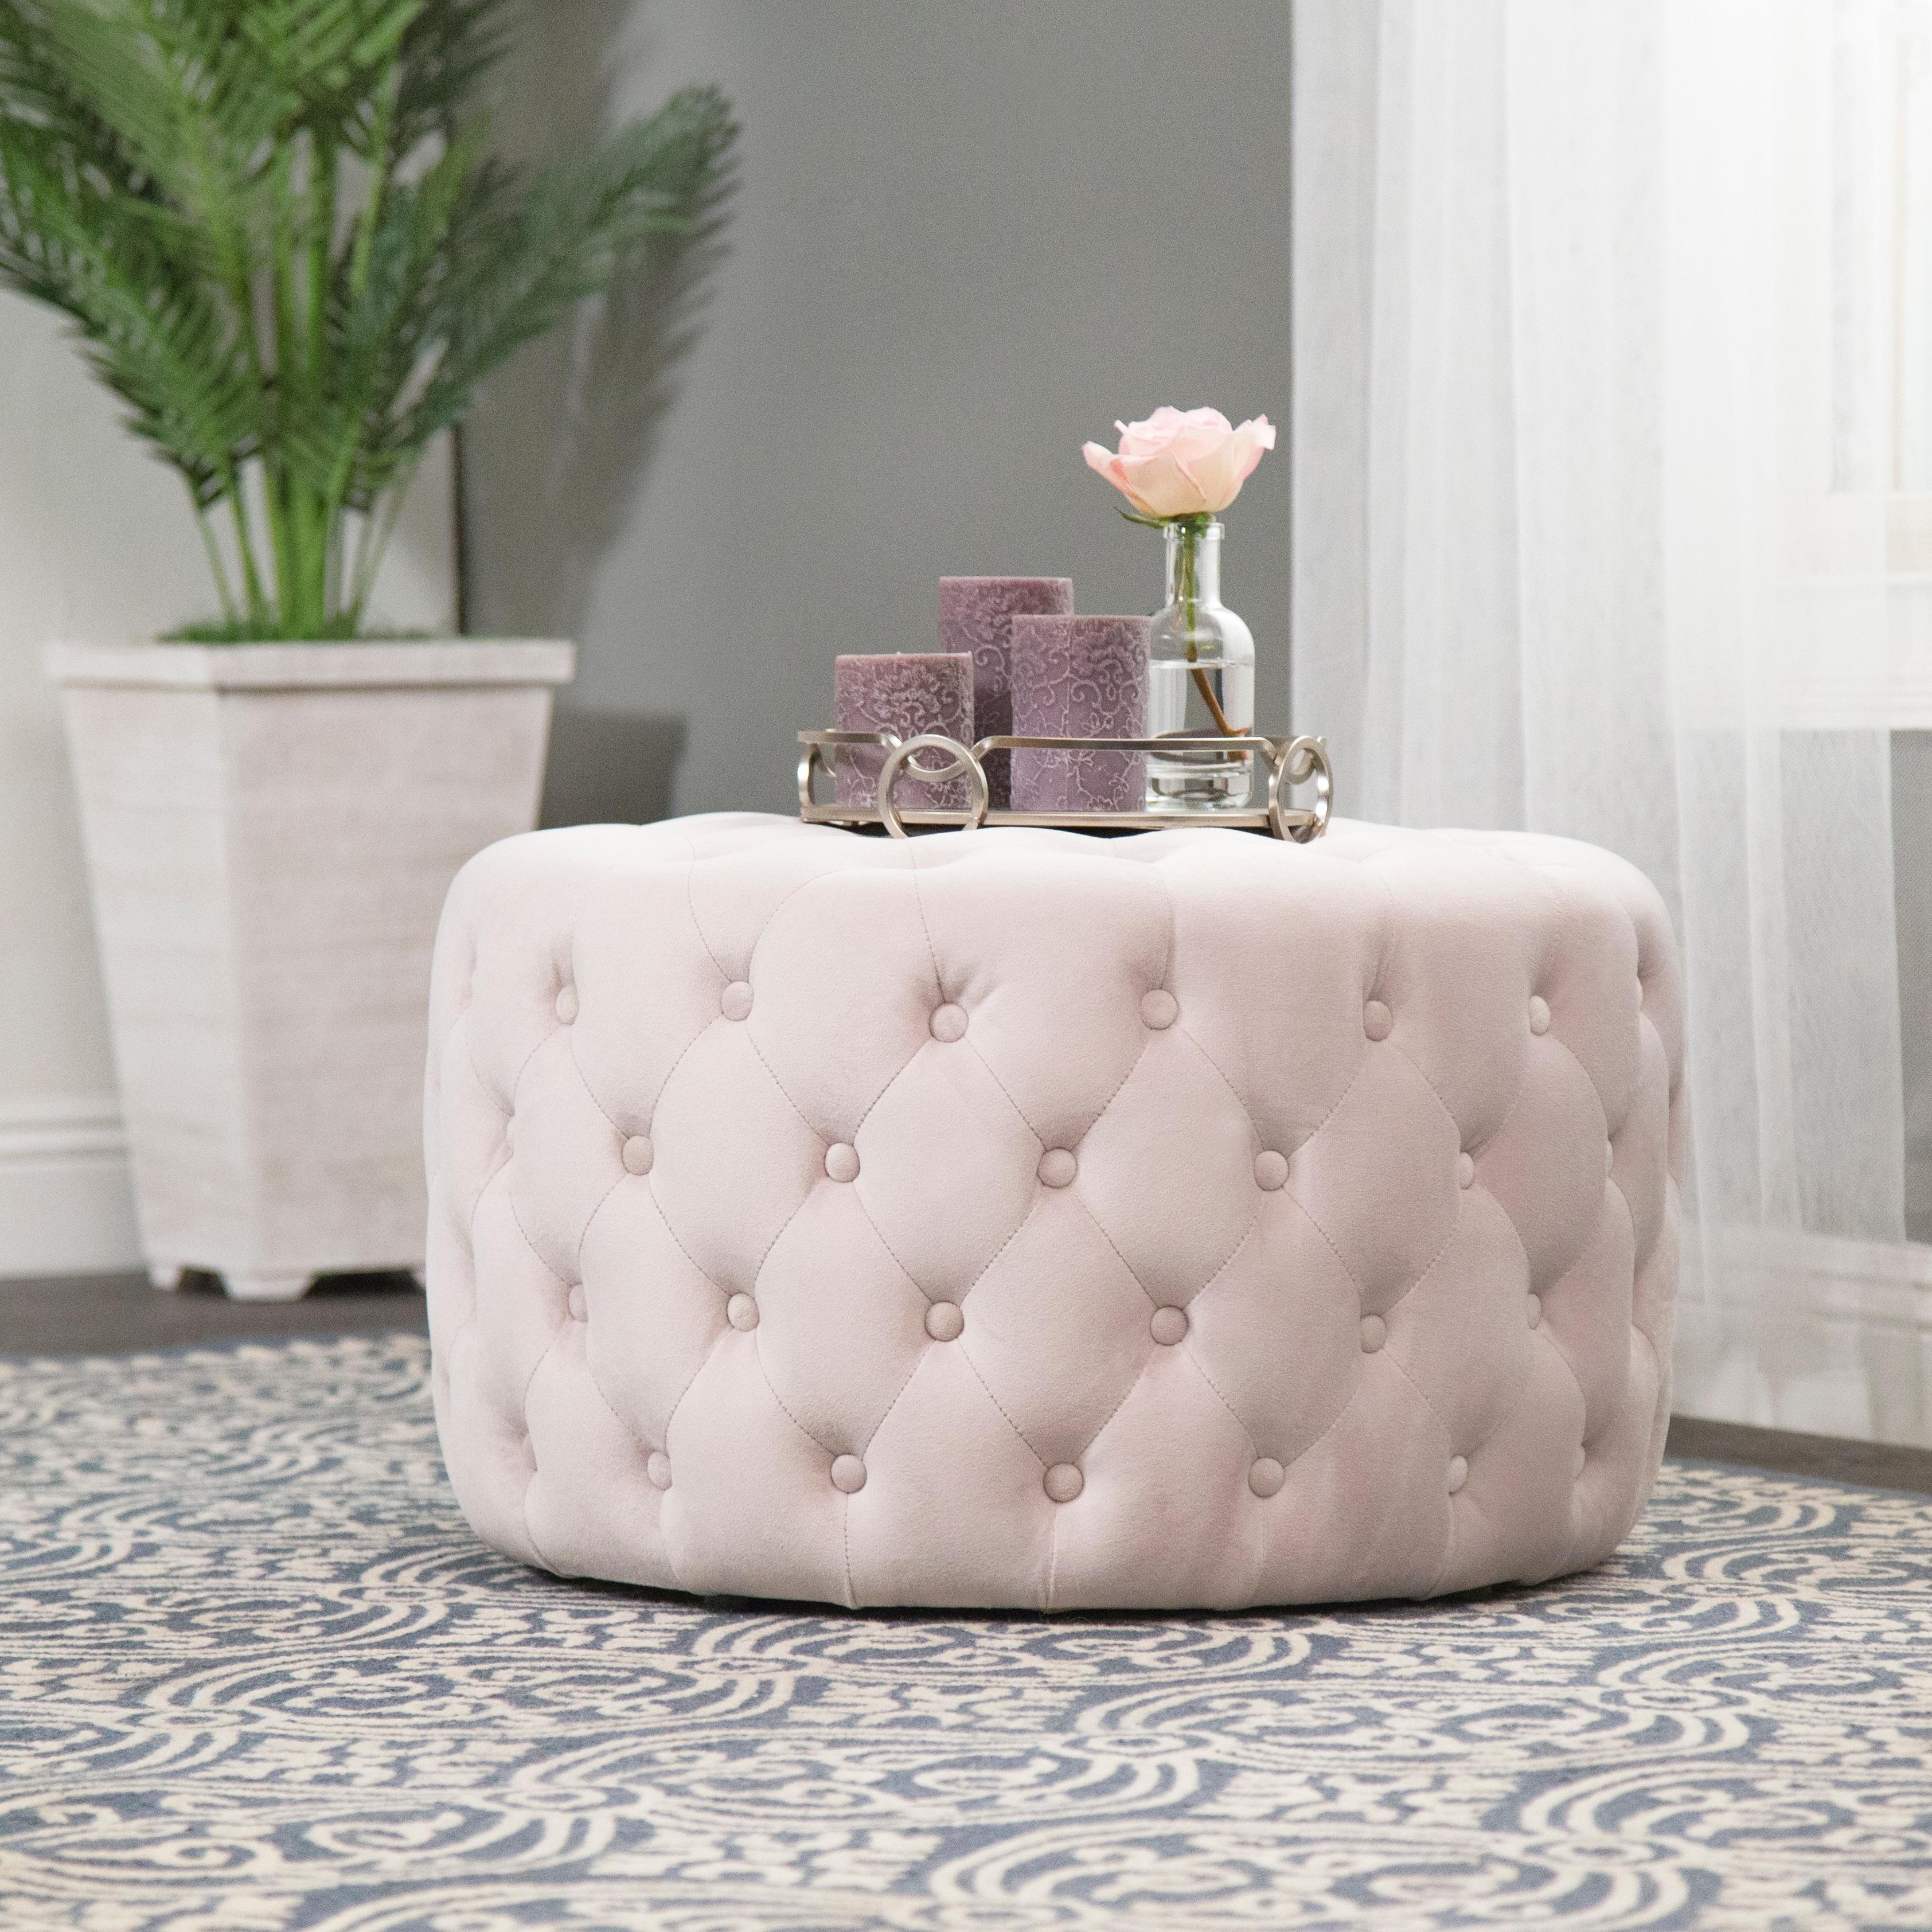 Super Abbyson Ella Ivory Tufted Round Velvet Ottoman Alphanode Cool Chair Designs And Ideas Alphanodeonline